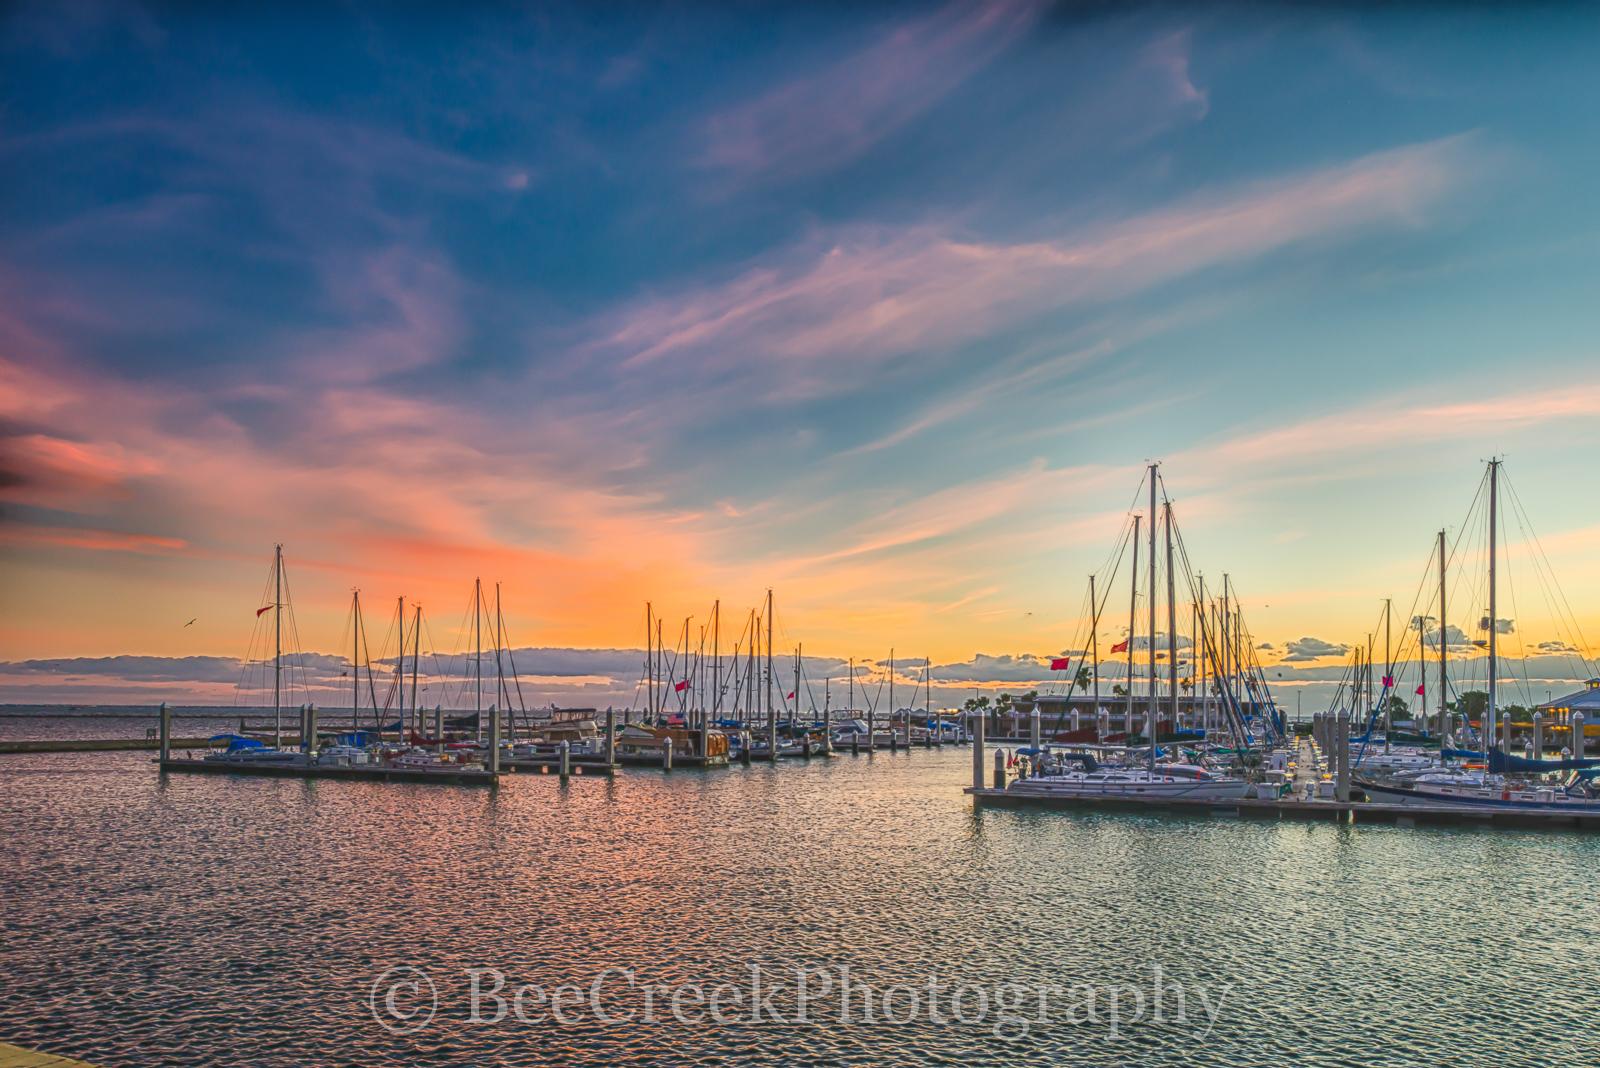 Corpus Christi sunrise, Sunrise, Texas Coast, bay, boats, city, coastal, colorful sky, docks, gulf, gulf of mexico, landscape, landscapes, marina, ocean, seascape, seawall, photo